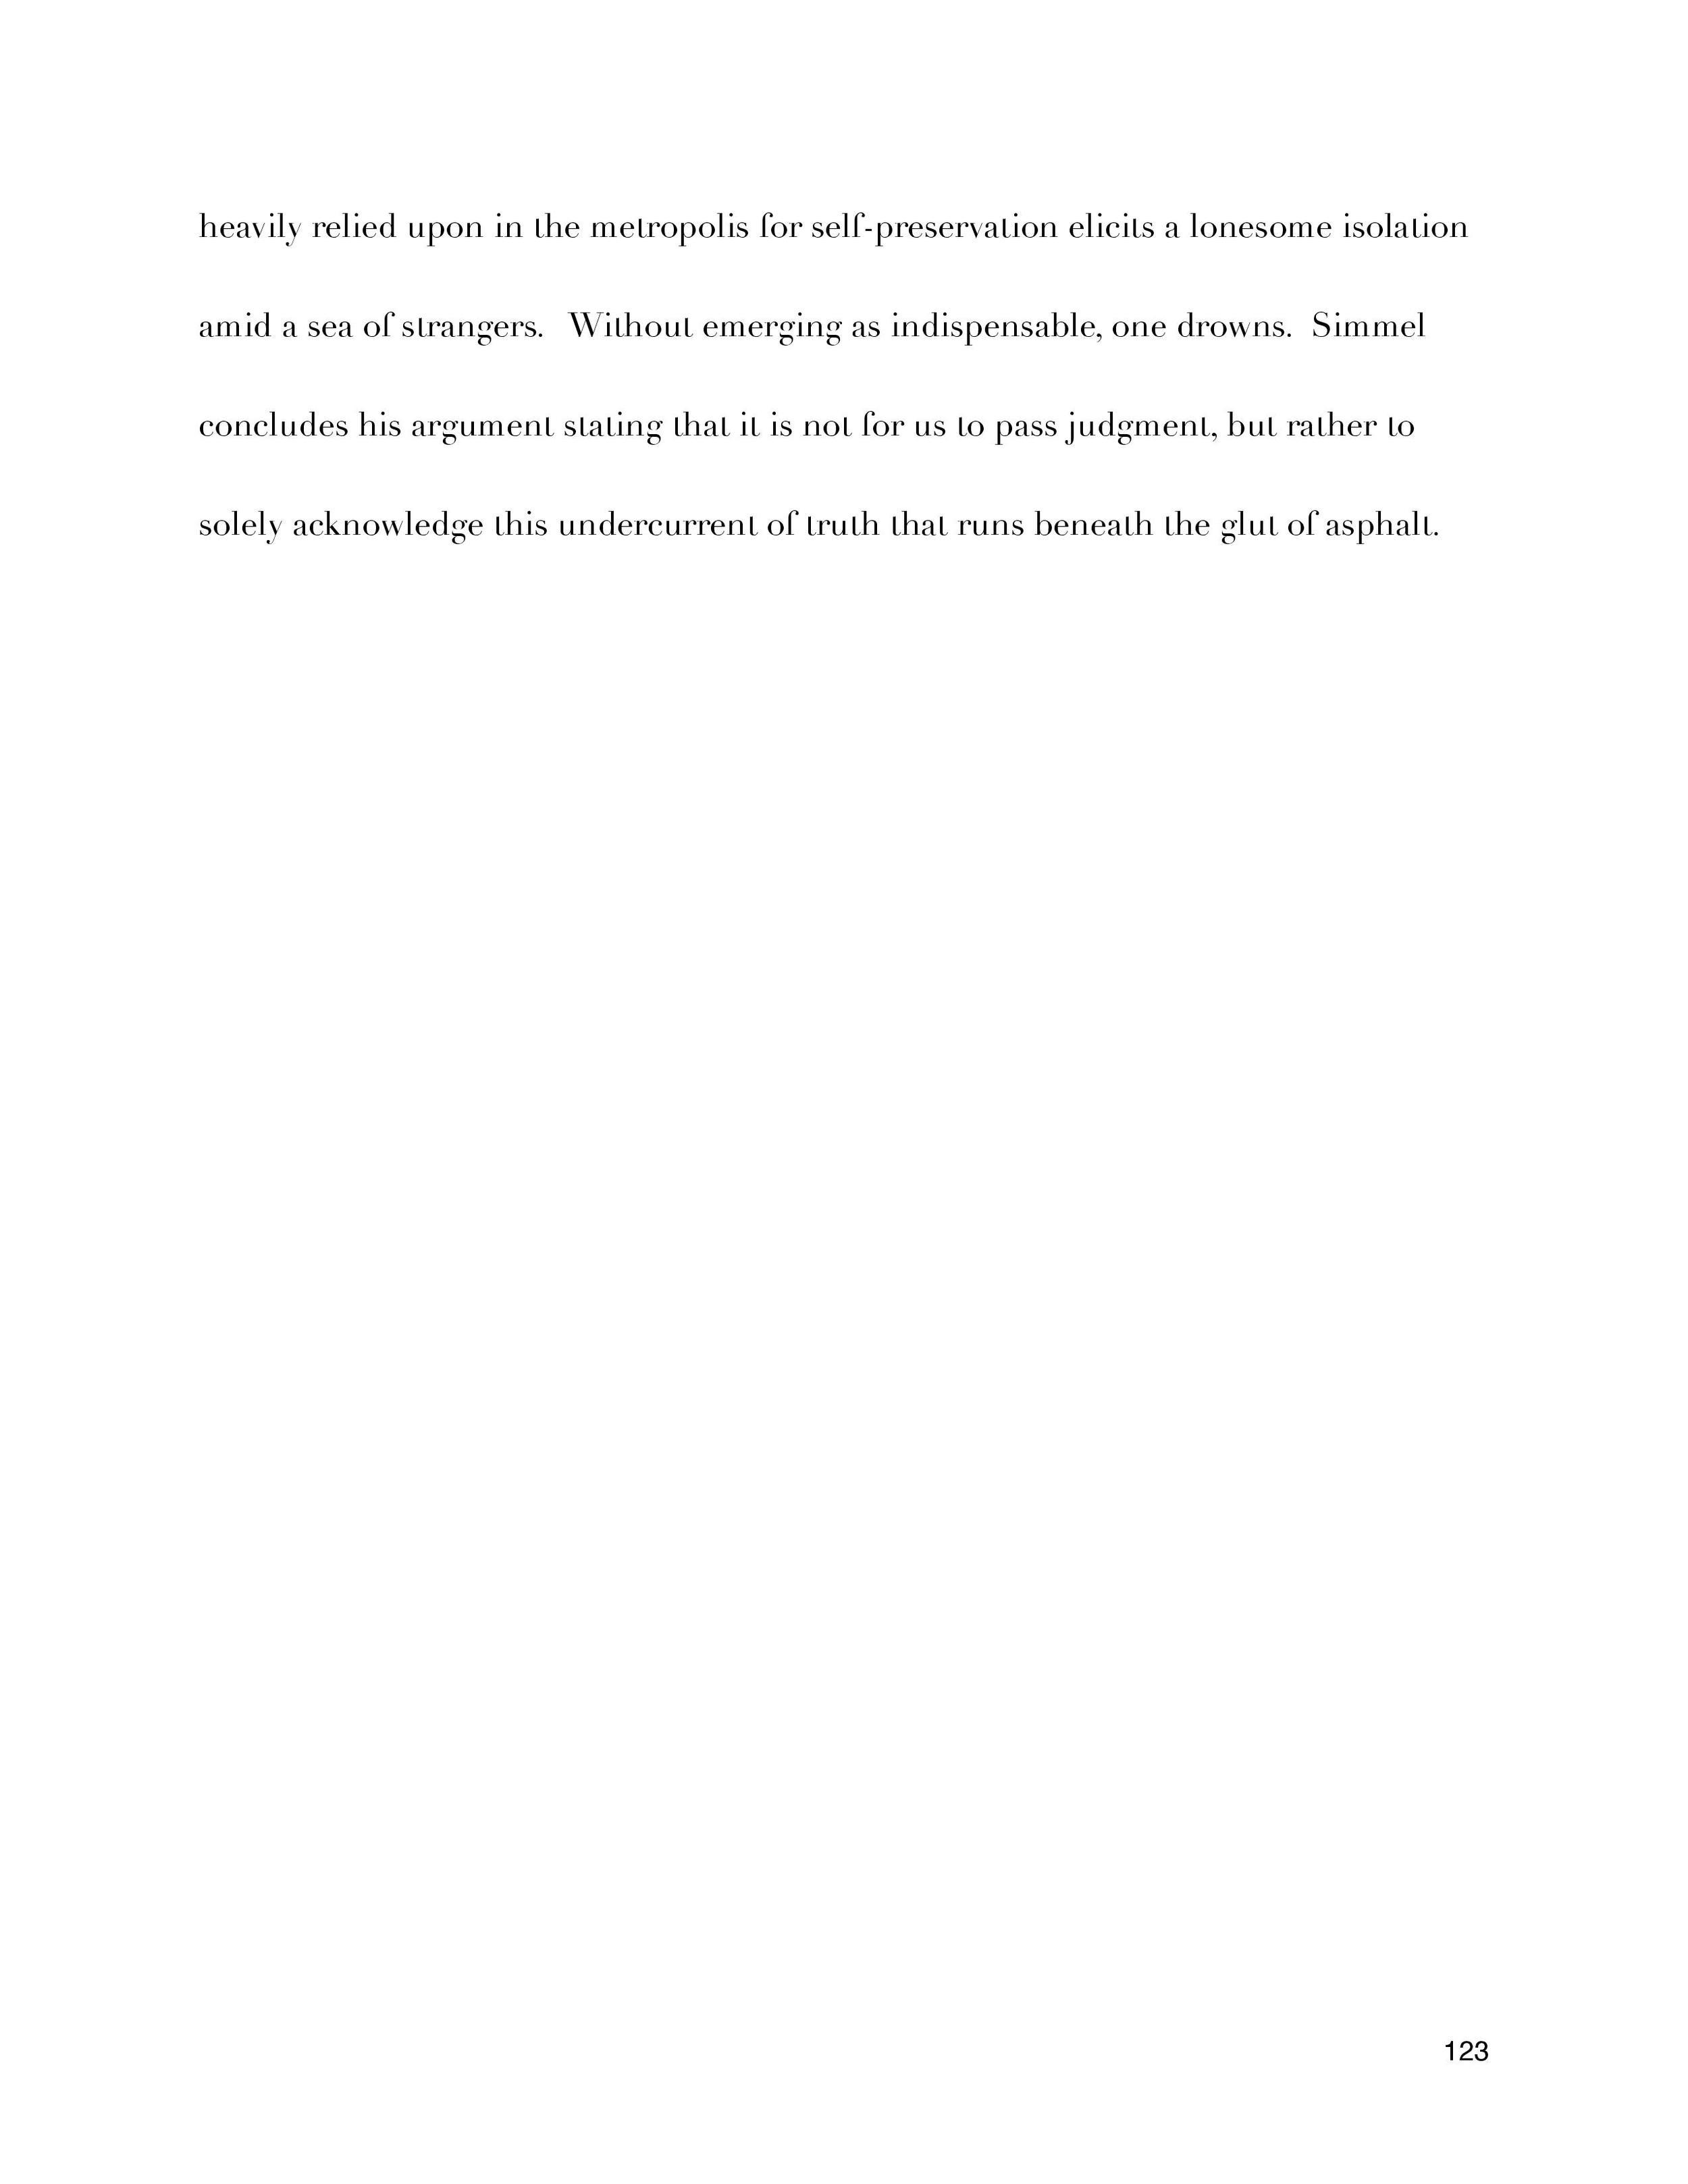 ShatteredGlass-page-124.jpg